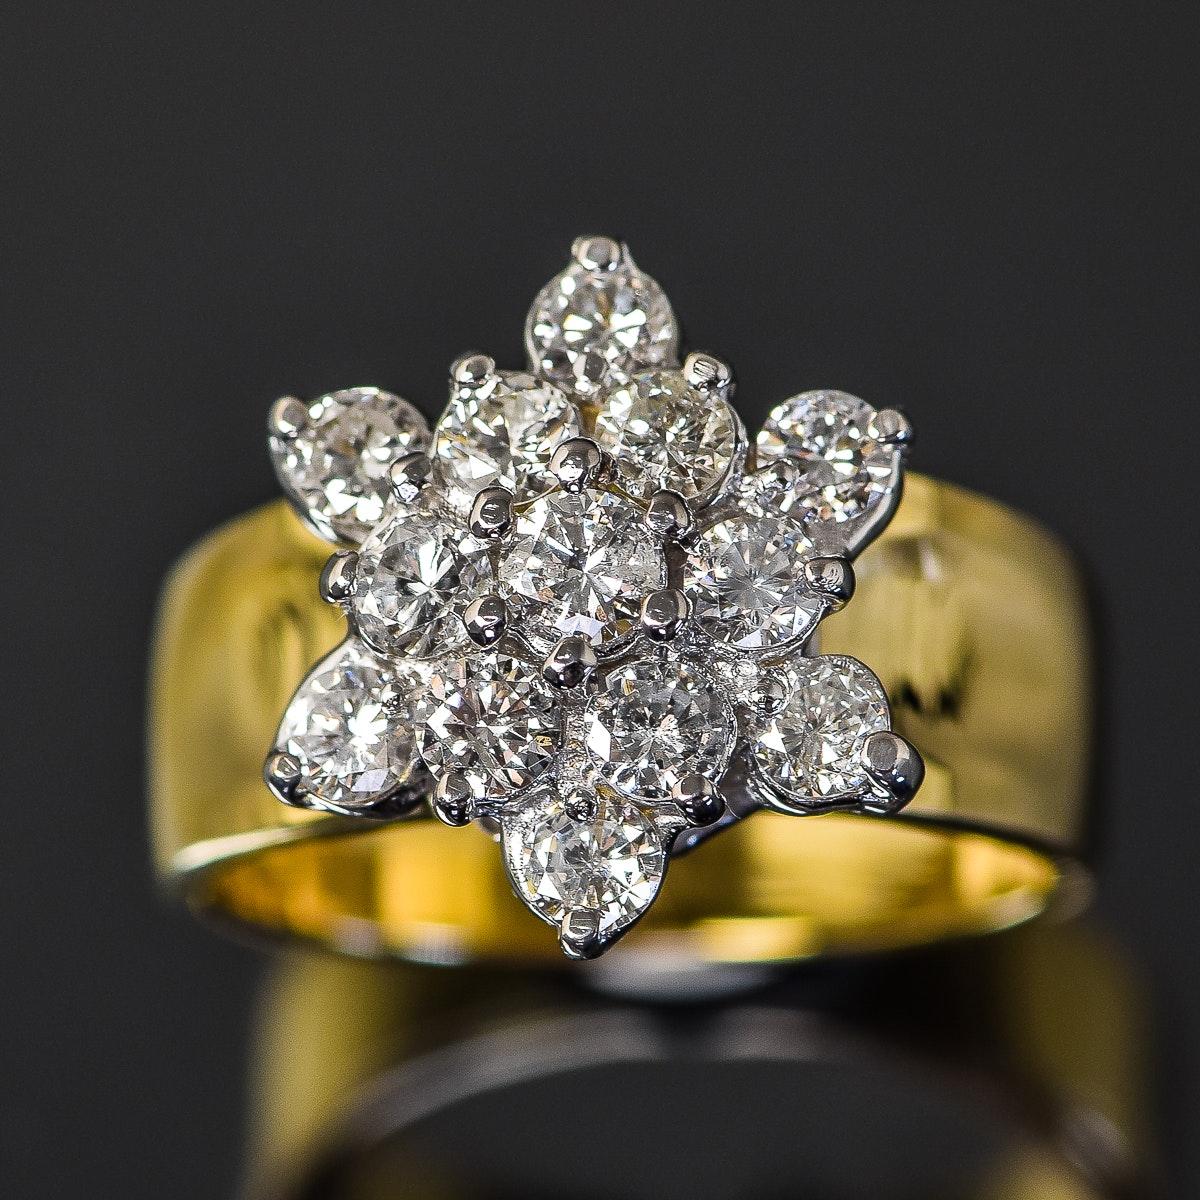 14K Yellow and White Gold 1.02 CTW Diamond Flower Ring